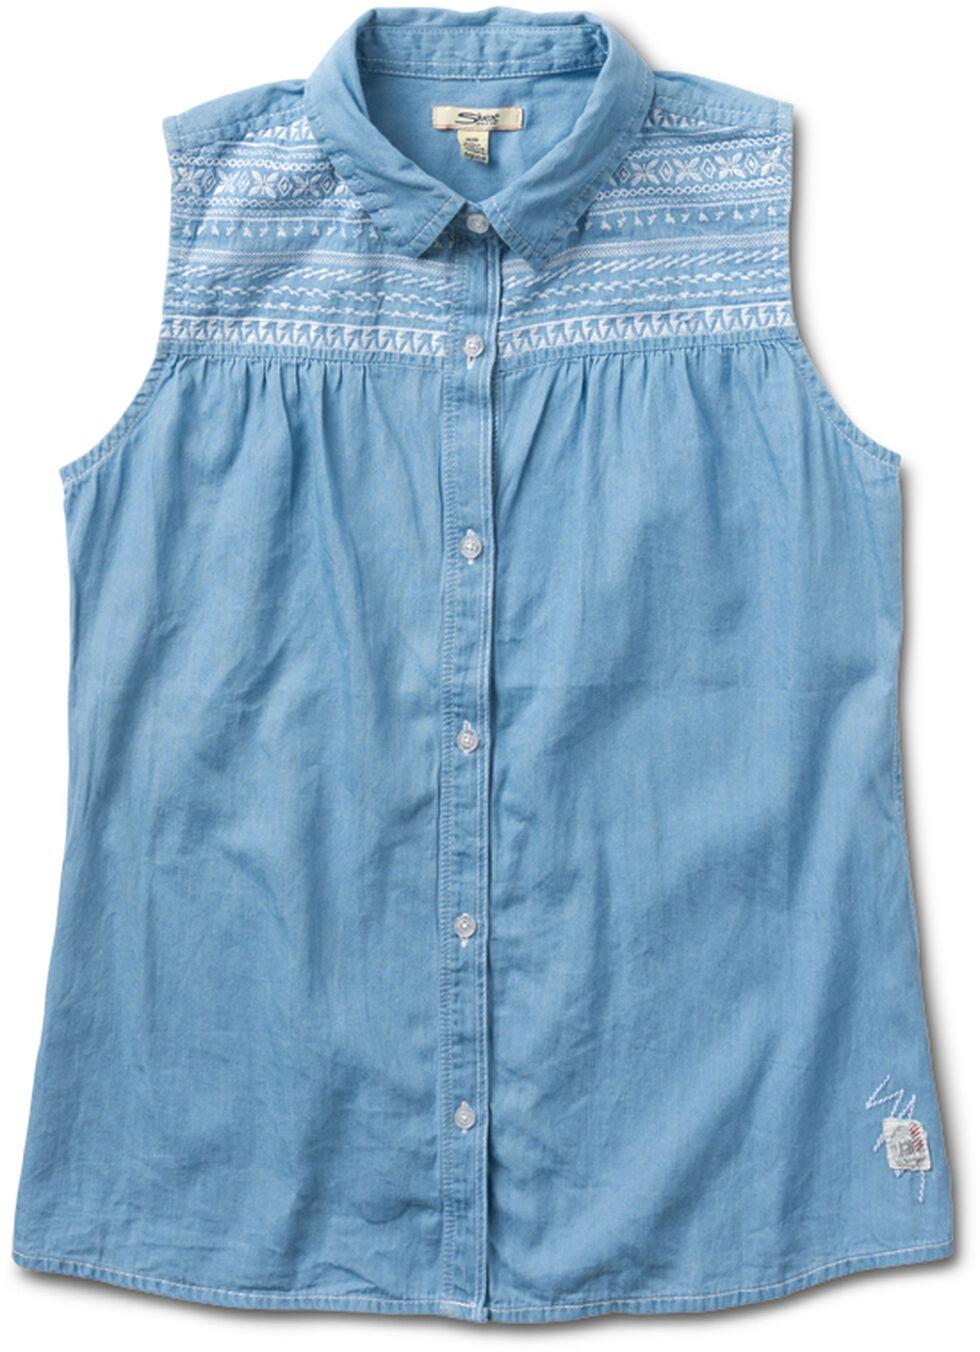 Silver Girls' Denim Light Wash Sleevless Shirt, , hi-res